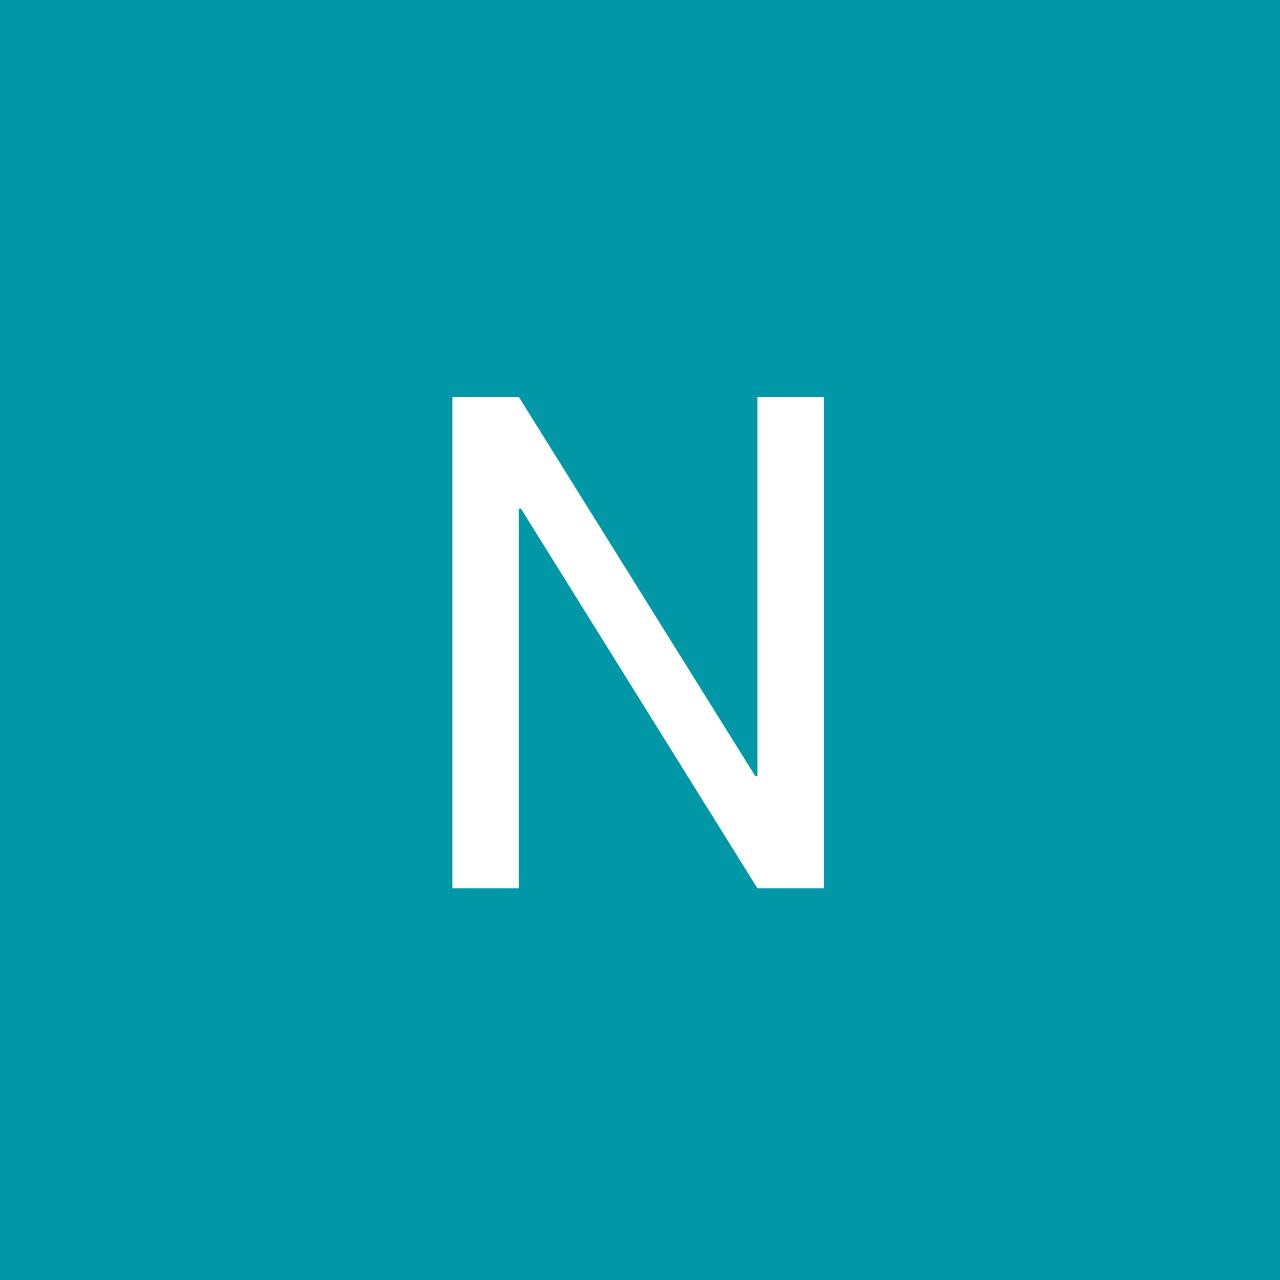 Nick Nouriani